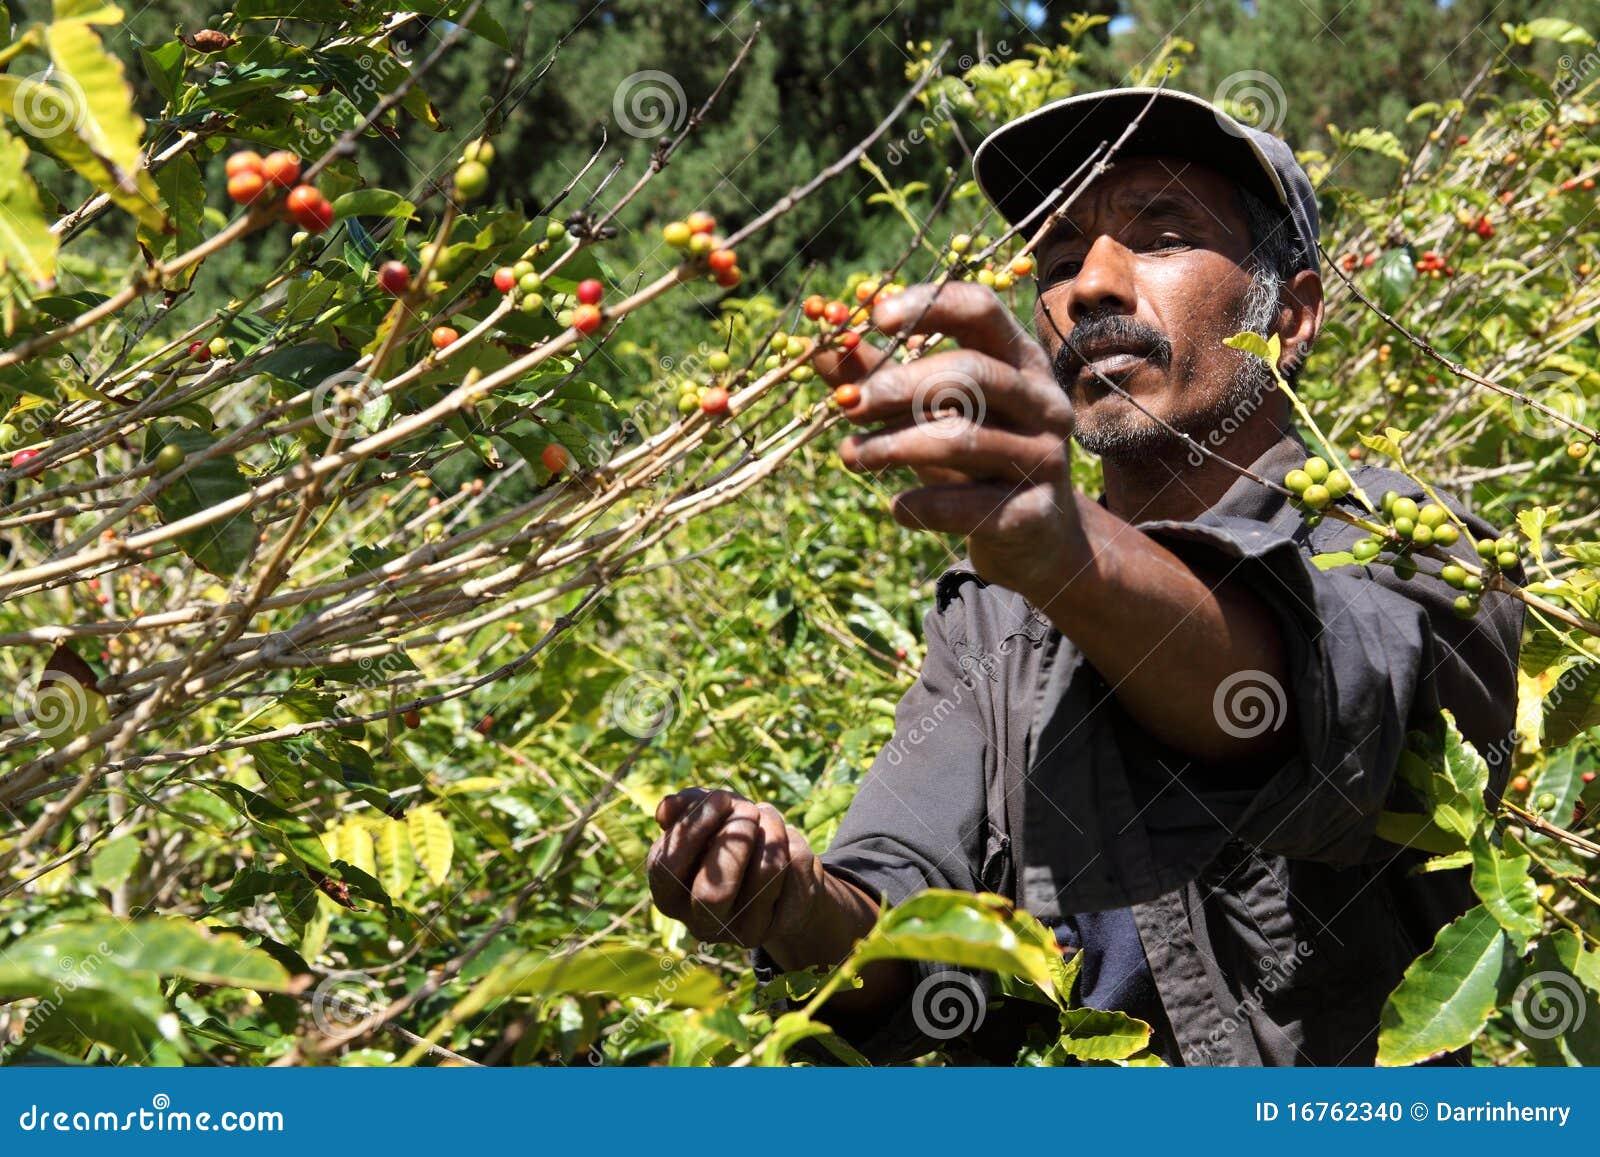 st helena coffee farmer picking ripe cherry beans stock